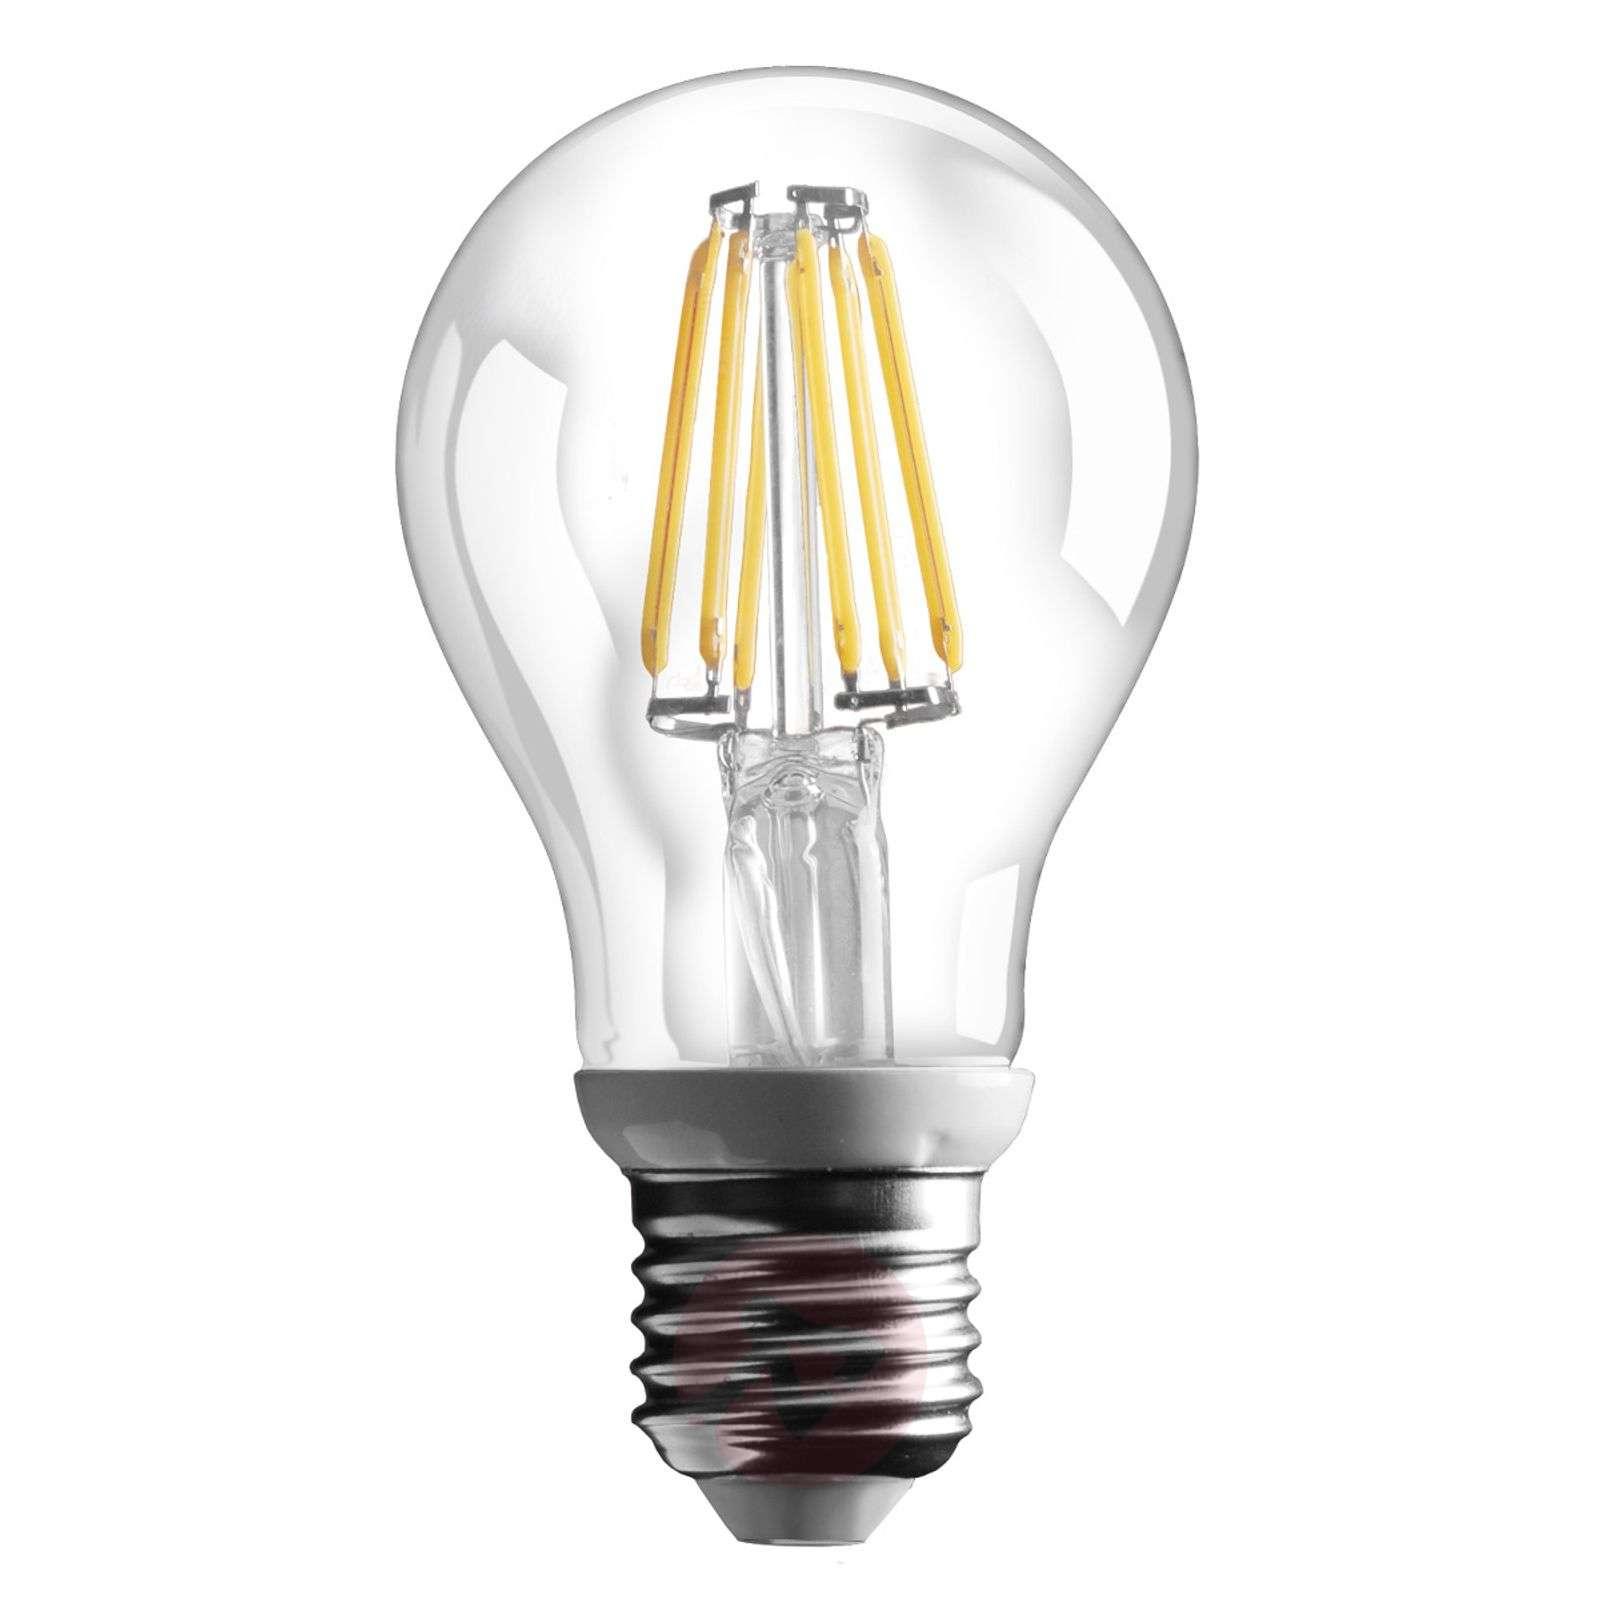 E27 6 W LED-filamenttilamppu 800 lm – lämmin valk.-3538053-01